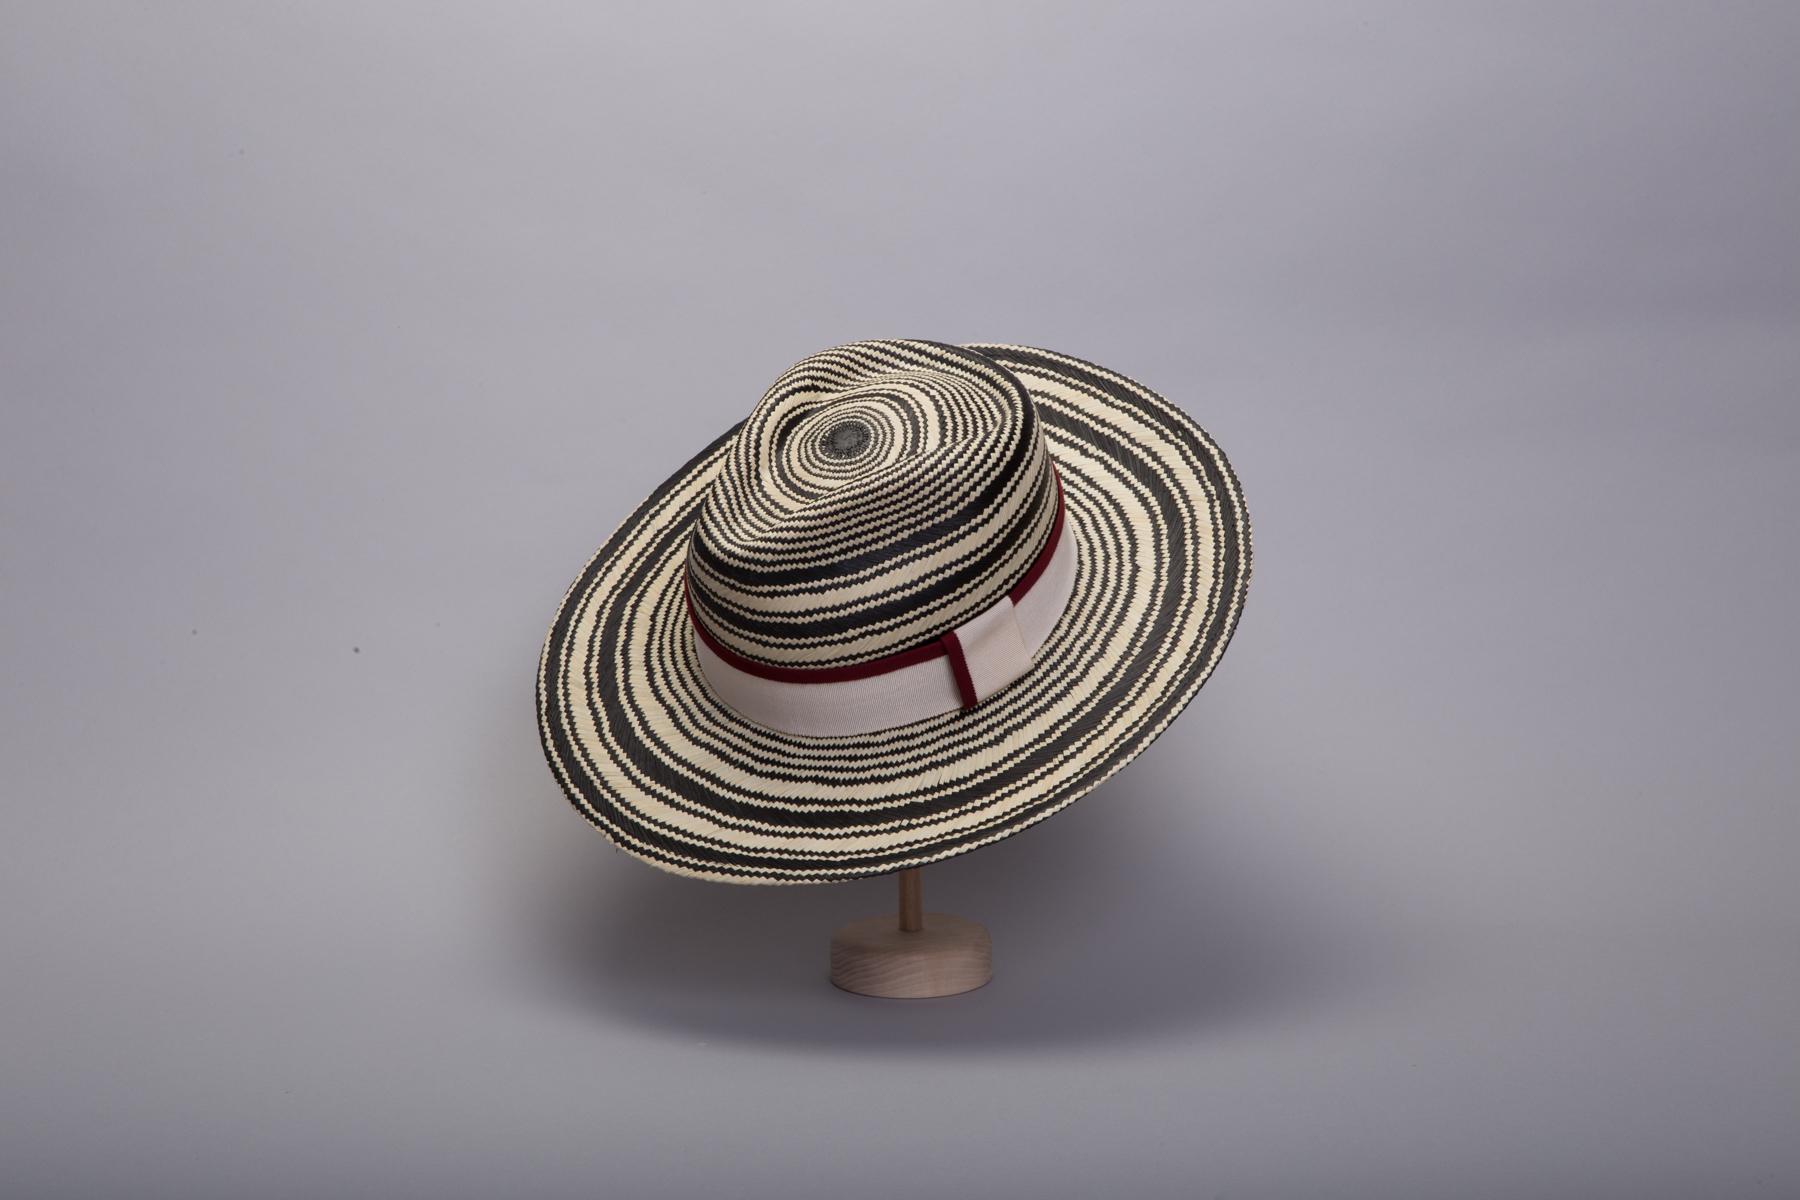 chapeau-panama-saintremy-1-1800x1200